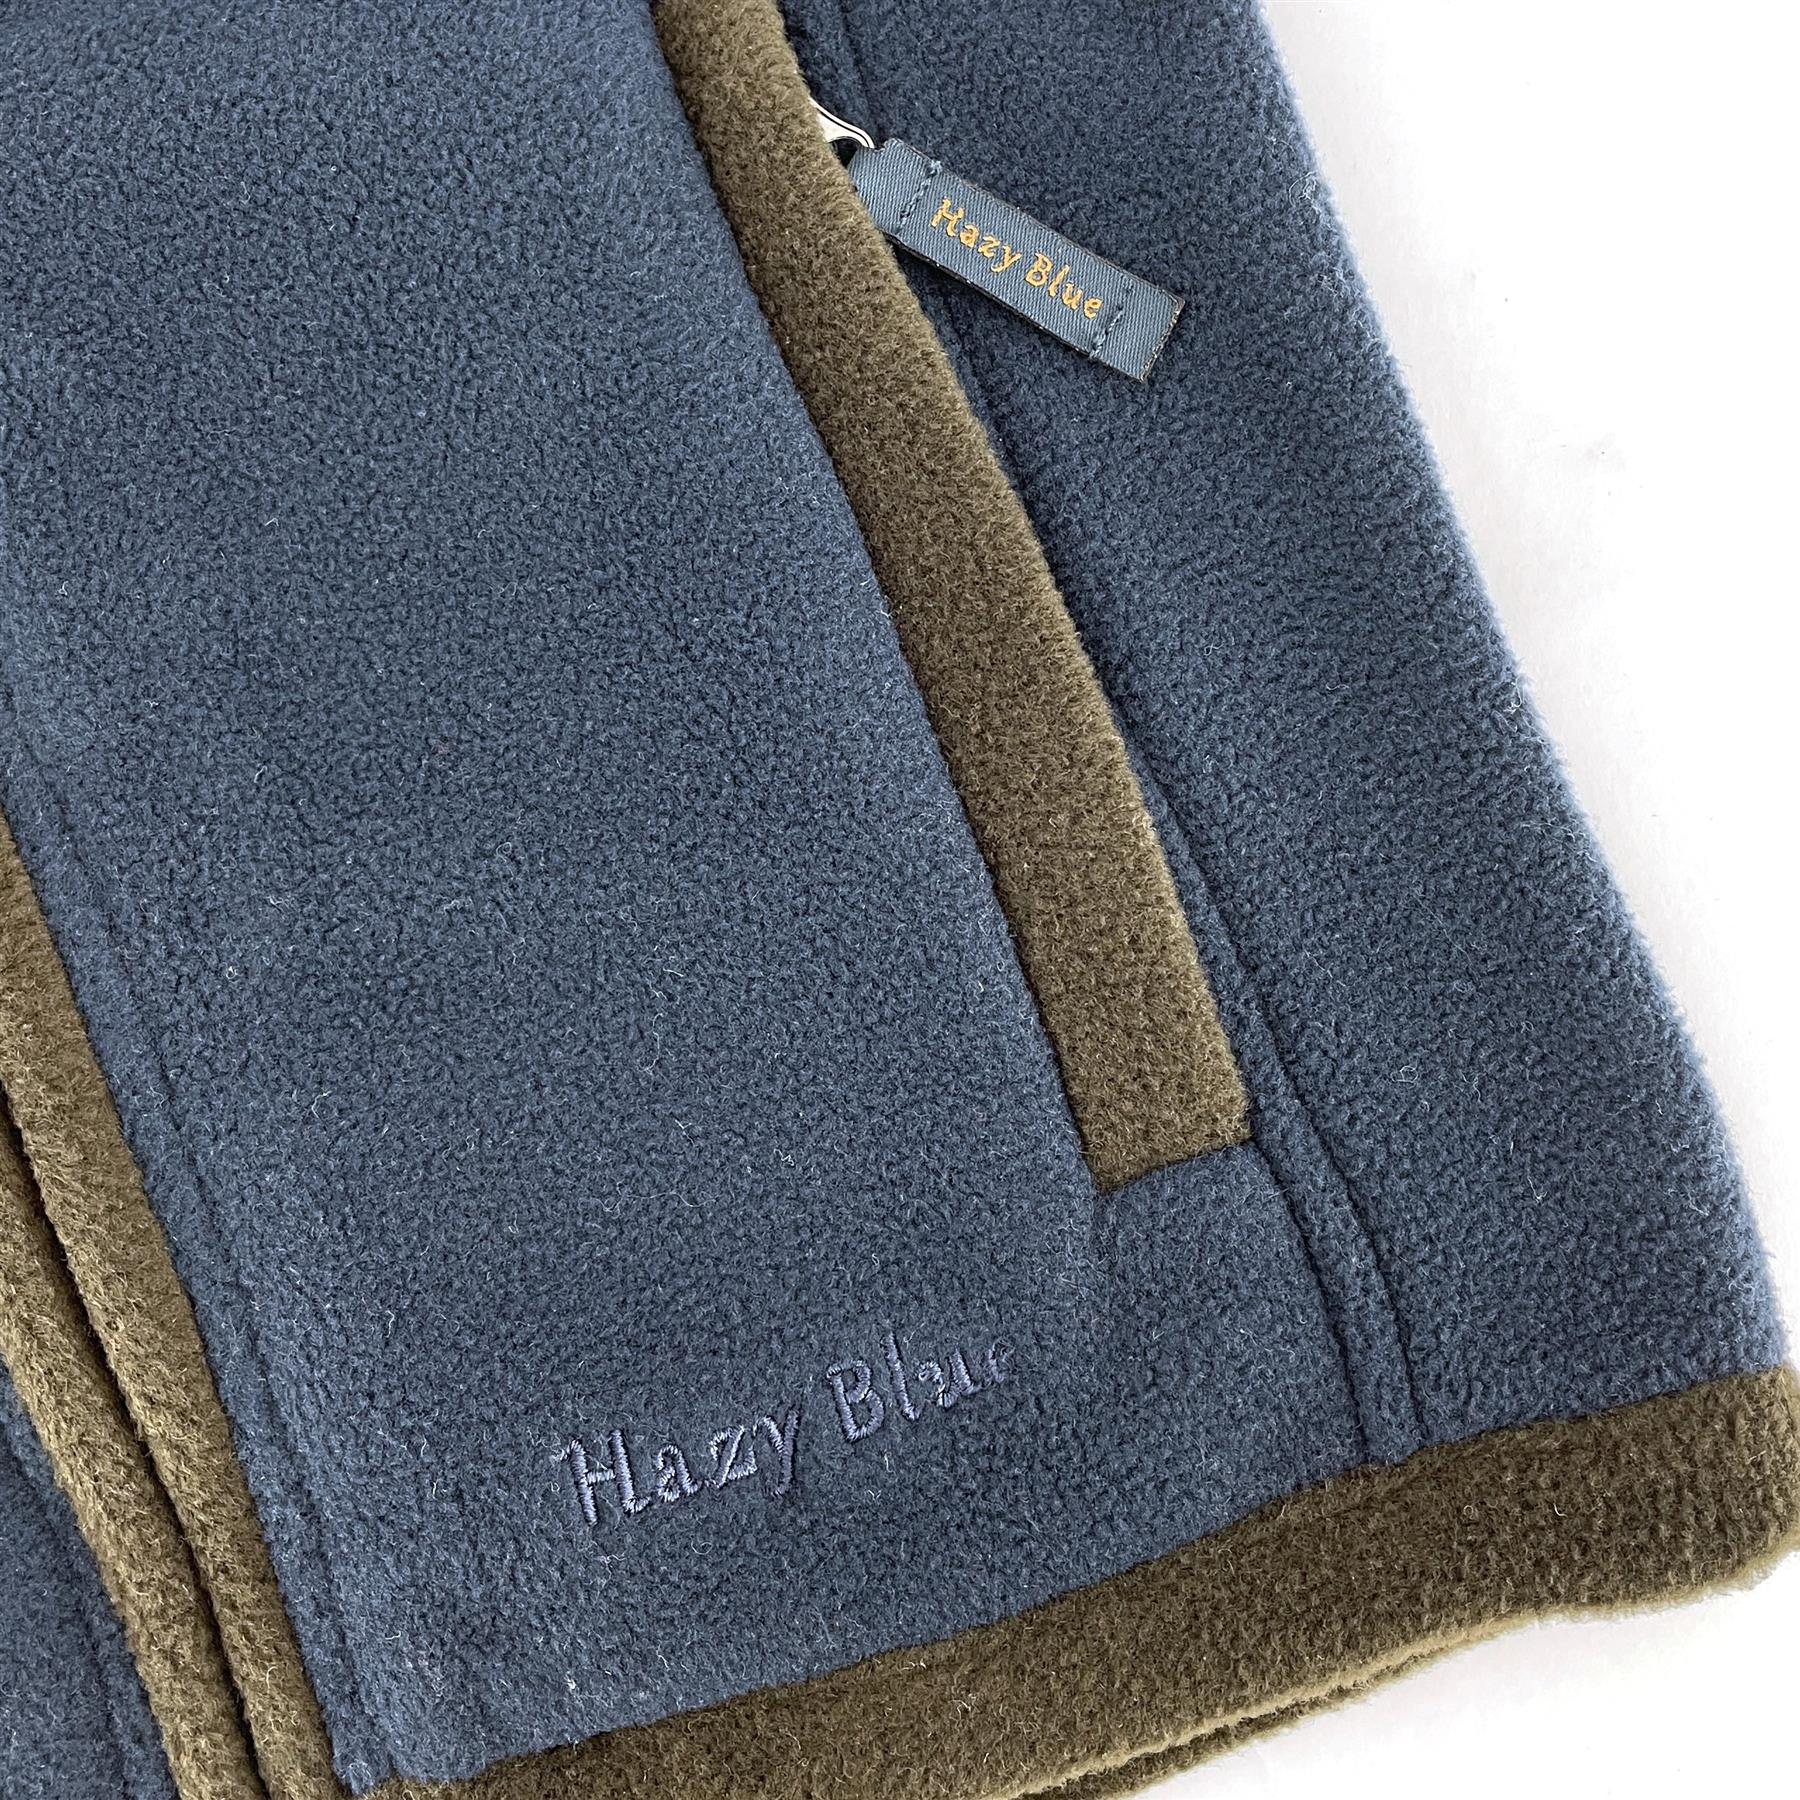 miniatuur 9 - Hazy Blue Kids Angus Pheasant Bodywarmer Boys Girls Gilet Vest Country Fleece